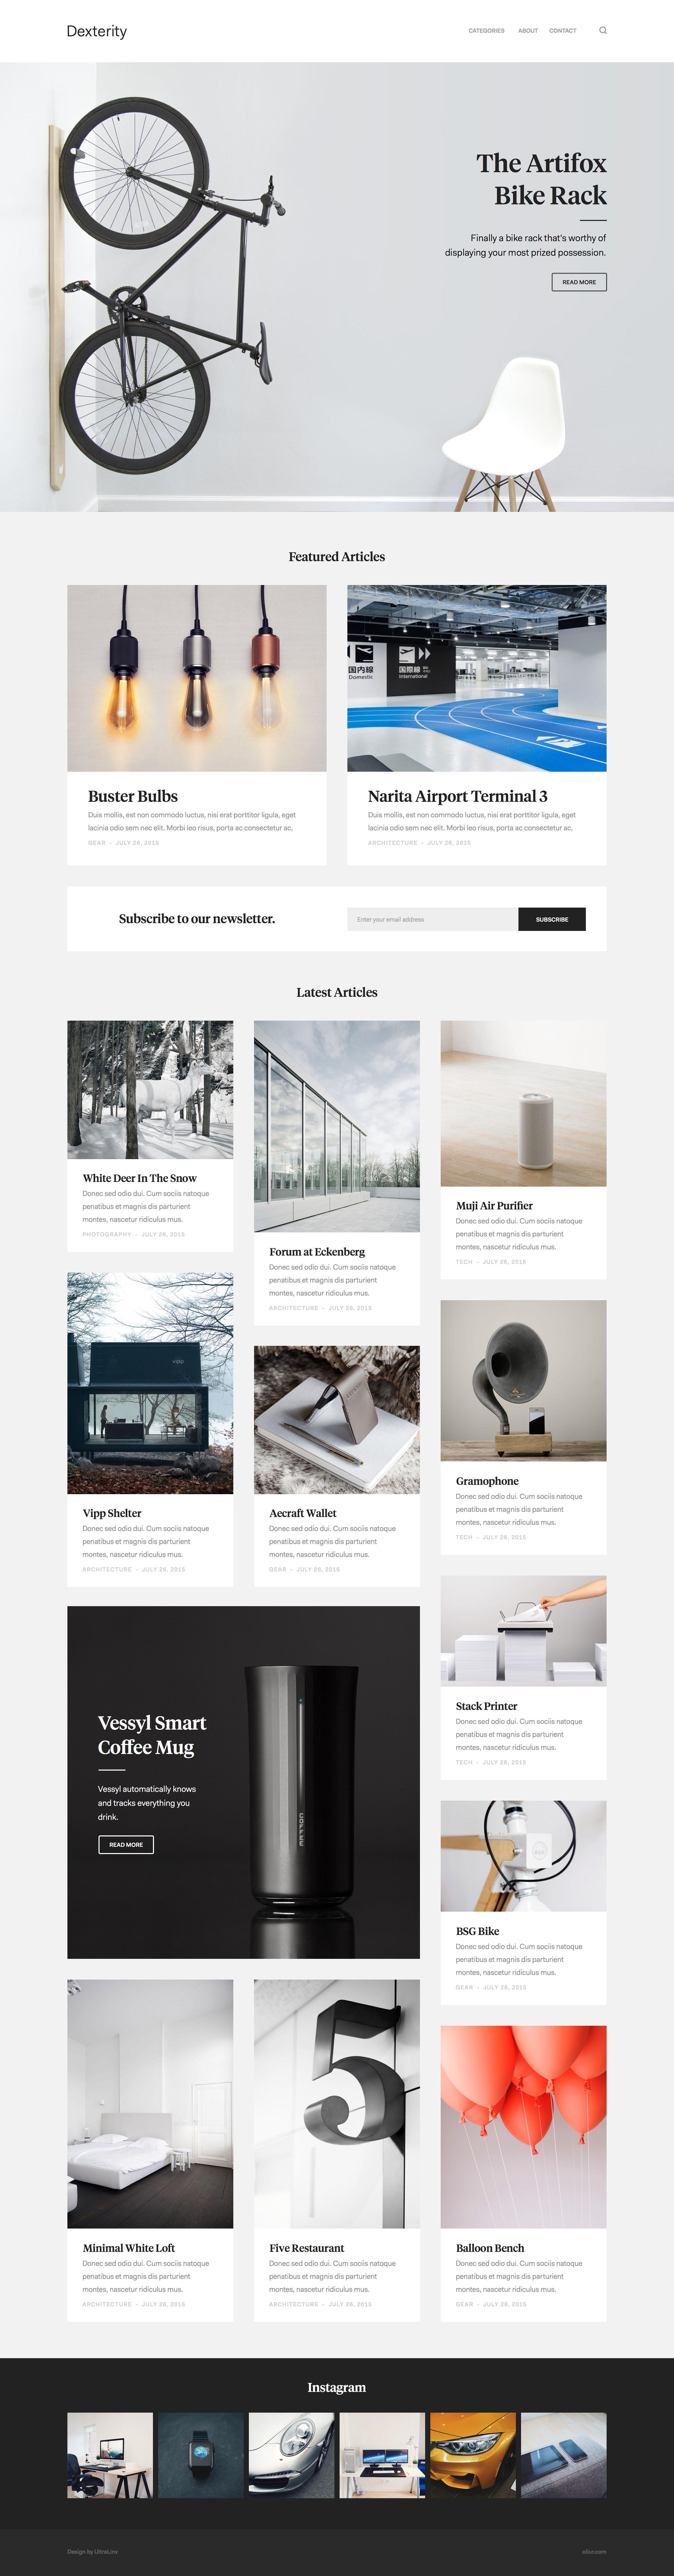 Pixels Jpg By Oliur Web Design Examples Website Design Layout Web App Design